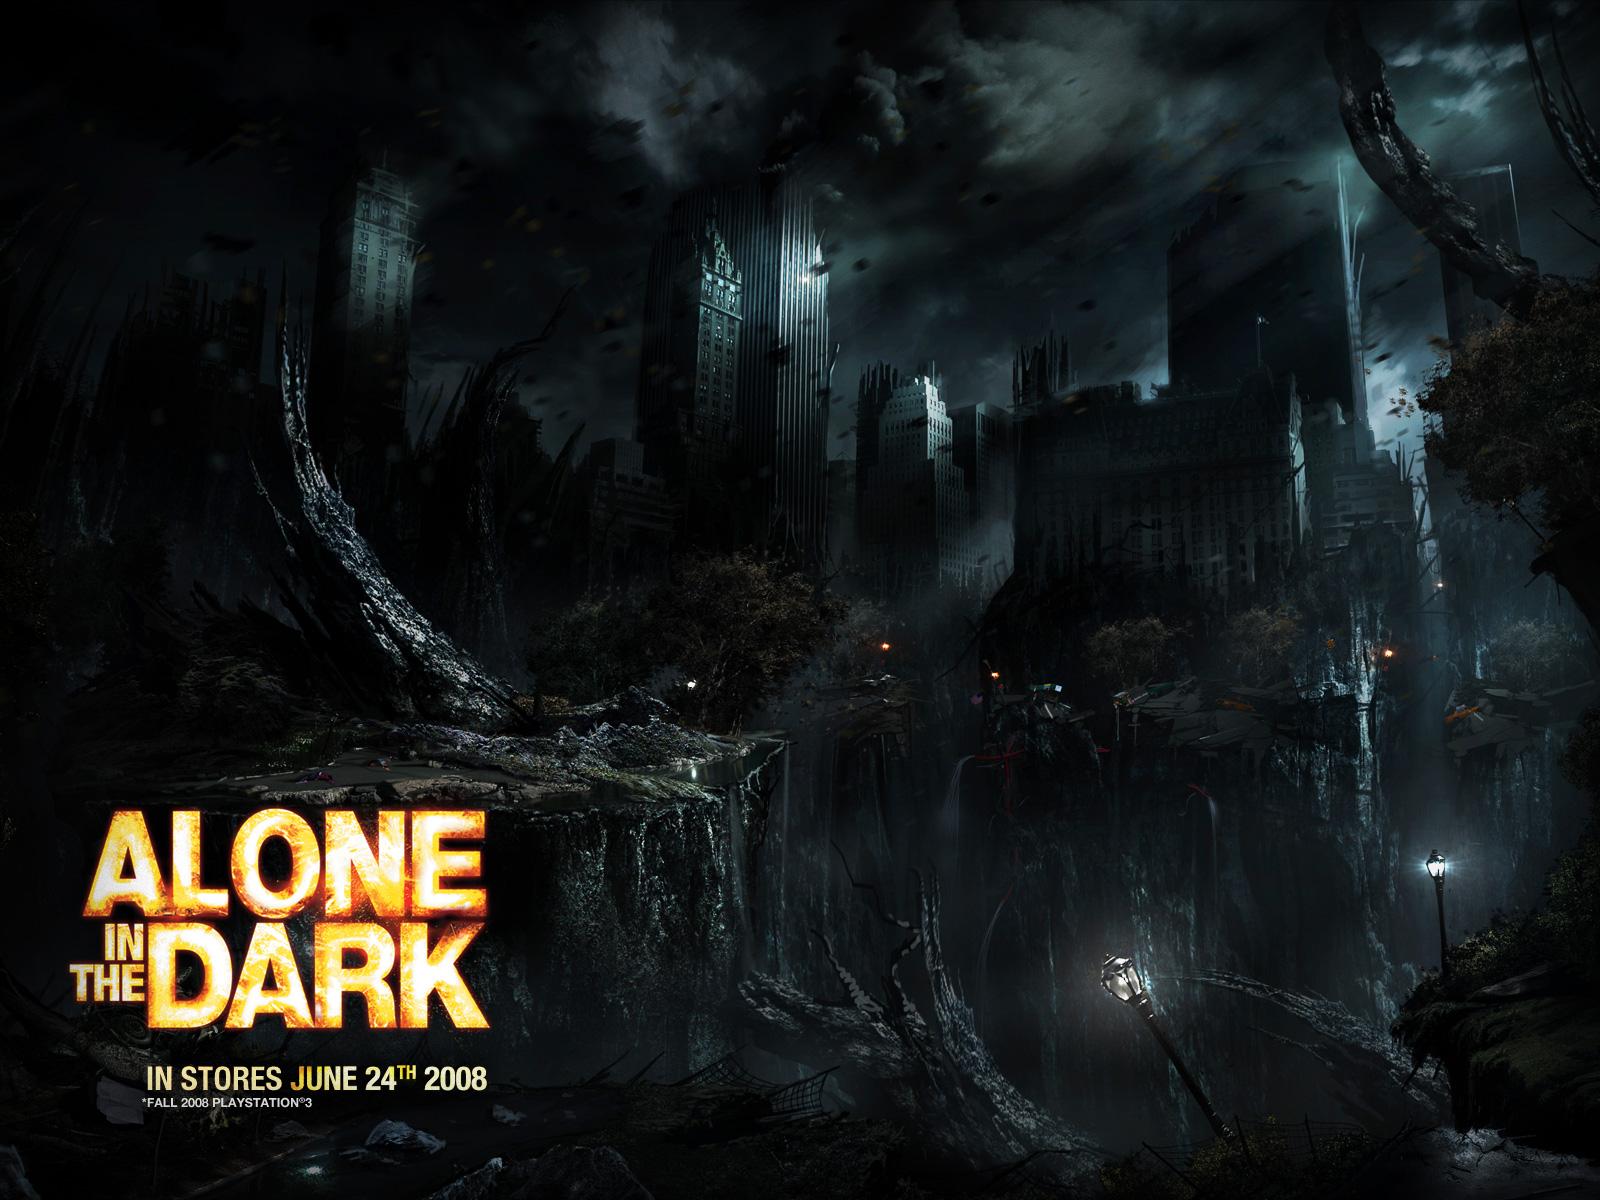 dark city alone dark wallpaper dark city wallpaper dark cityjpg 1600x1200